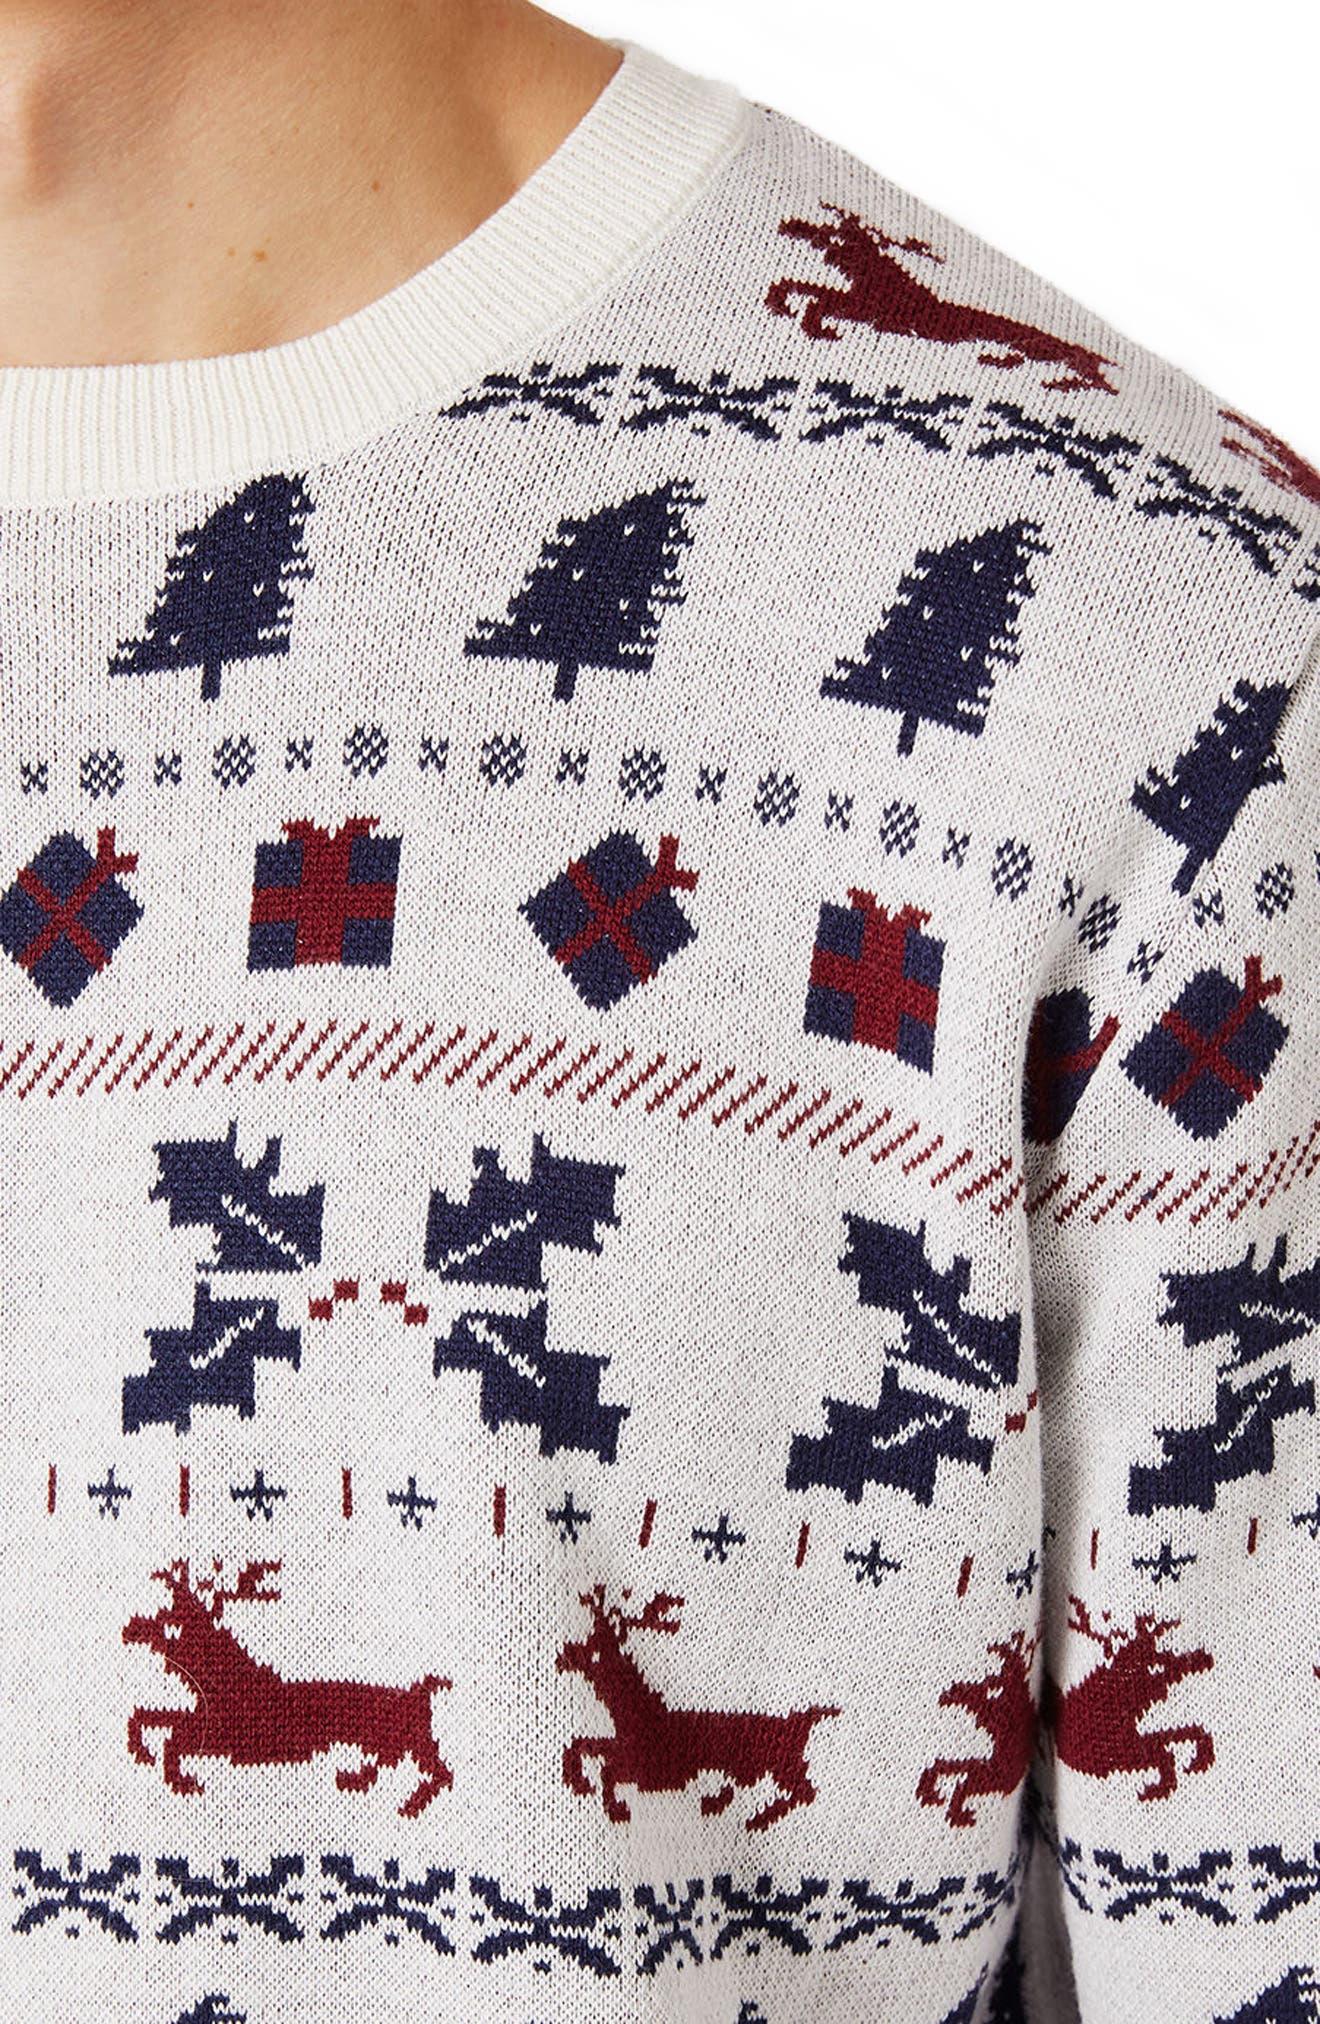 TOPMAN,                             Christmas Fair Isle Sweater,                             Alternate thumbnail 3, color,                             901